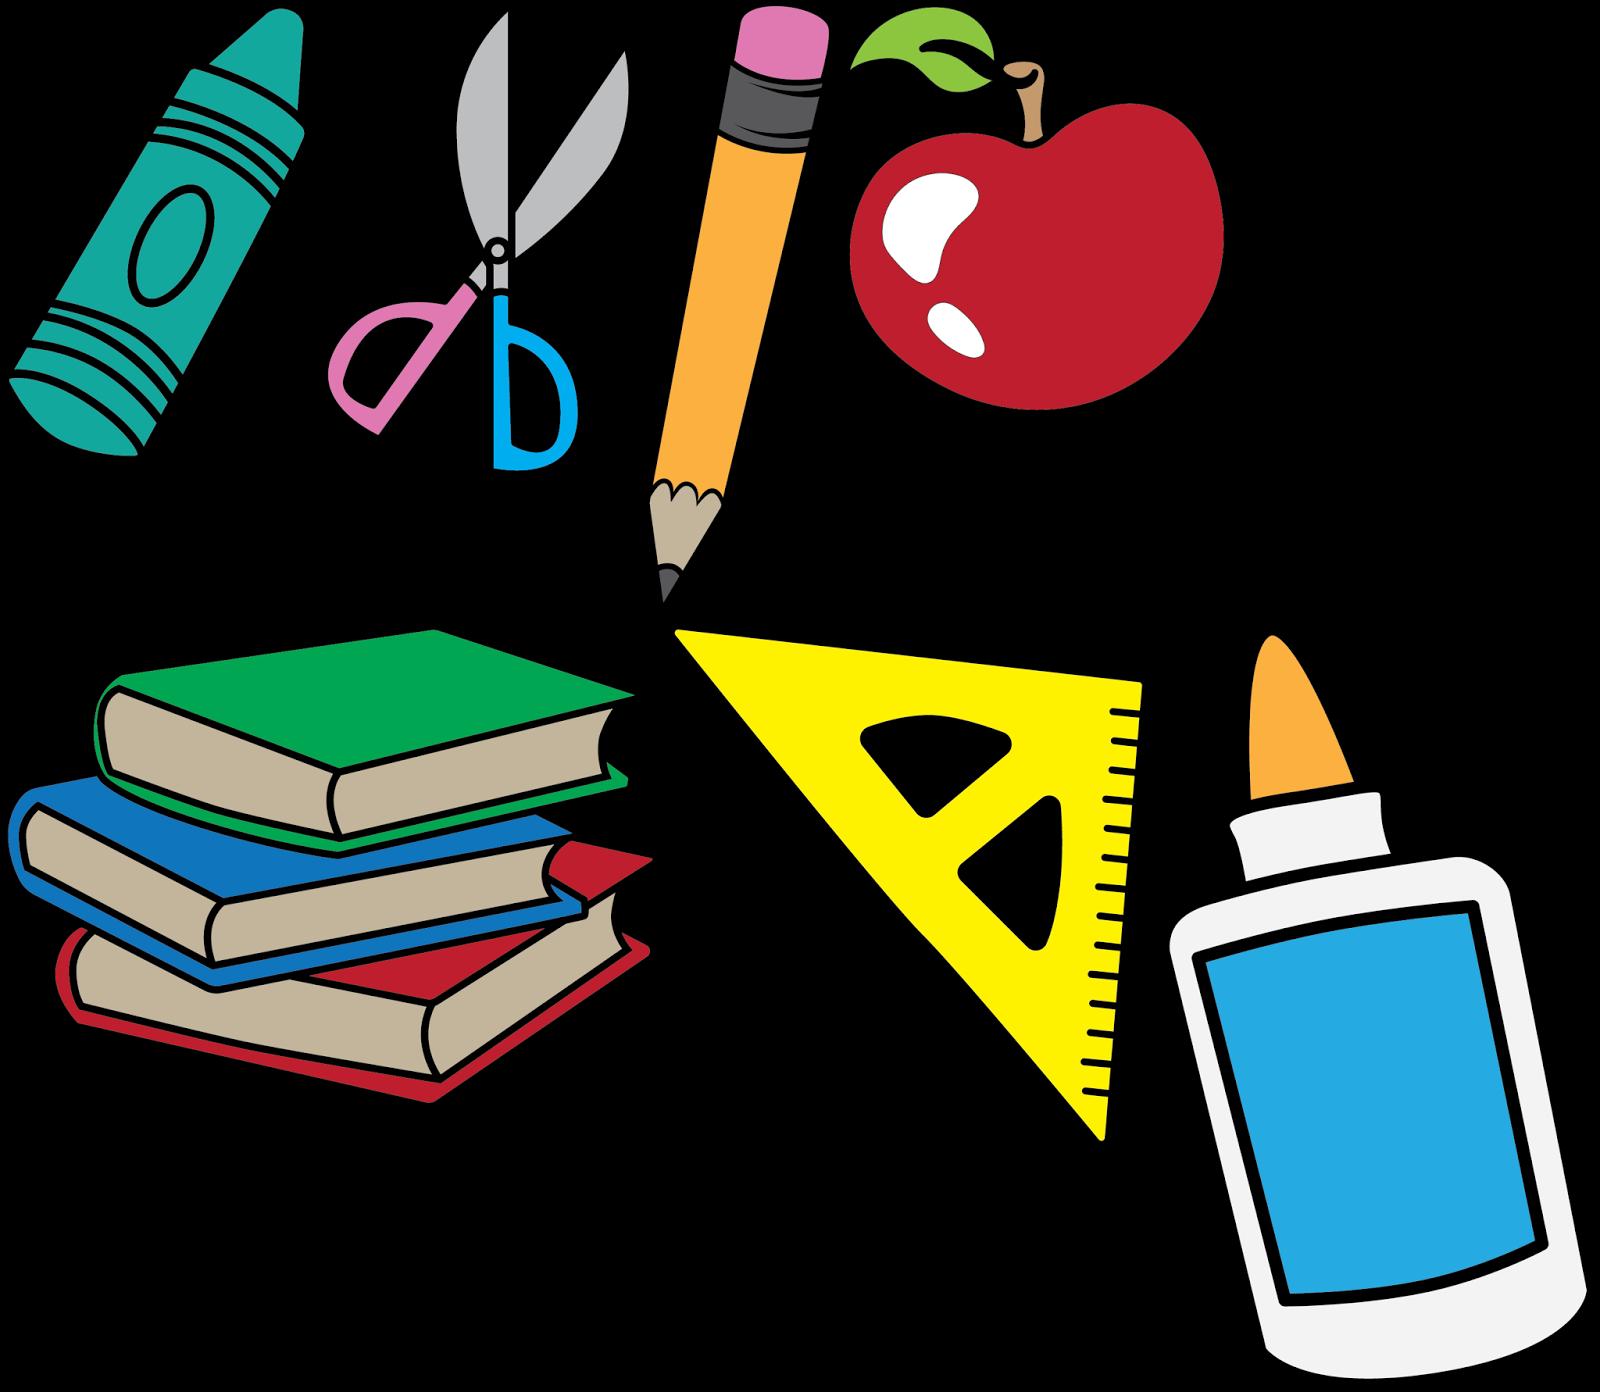 Prasad book distributors stationery. Crayons clipart scissors